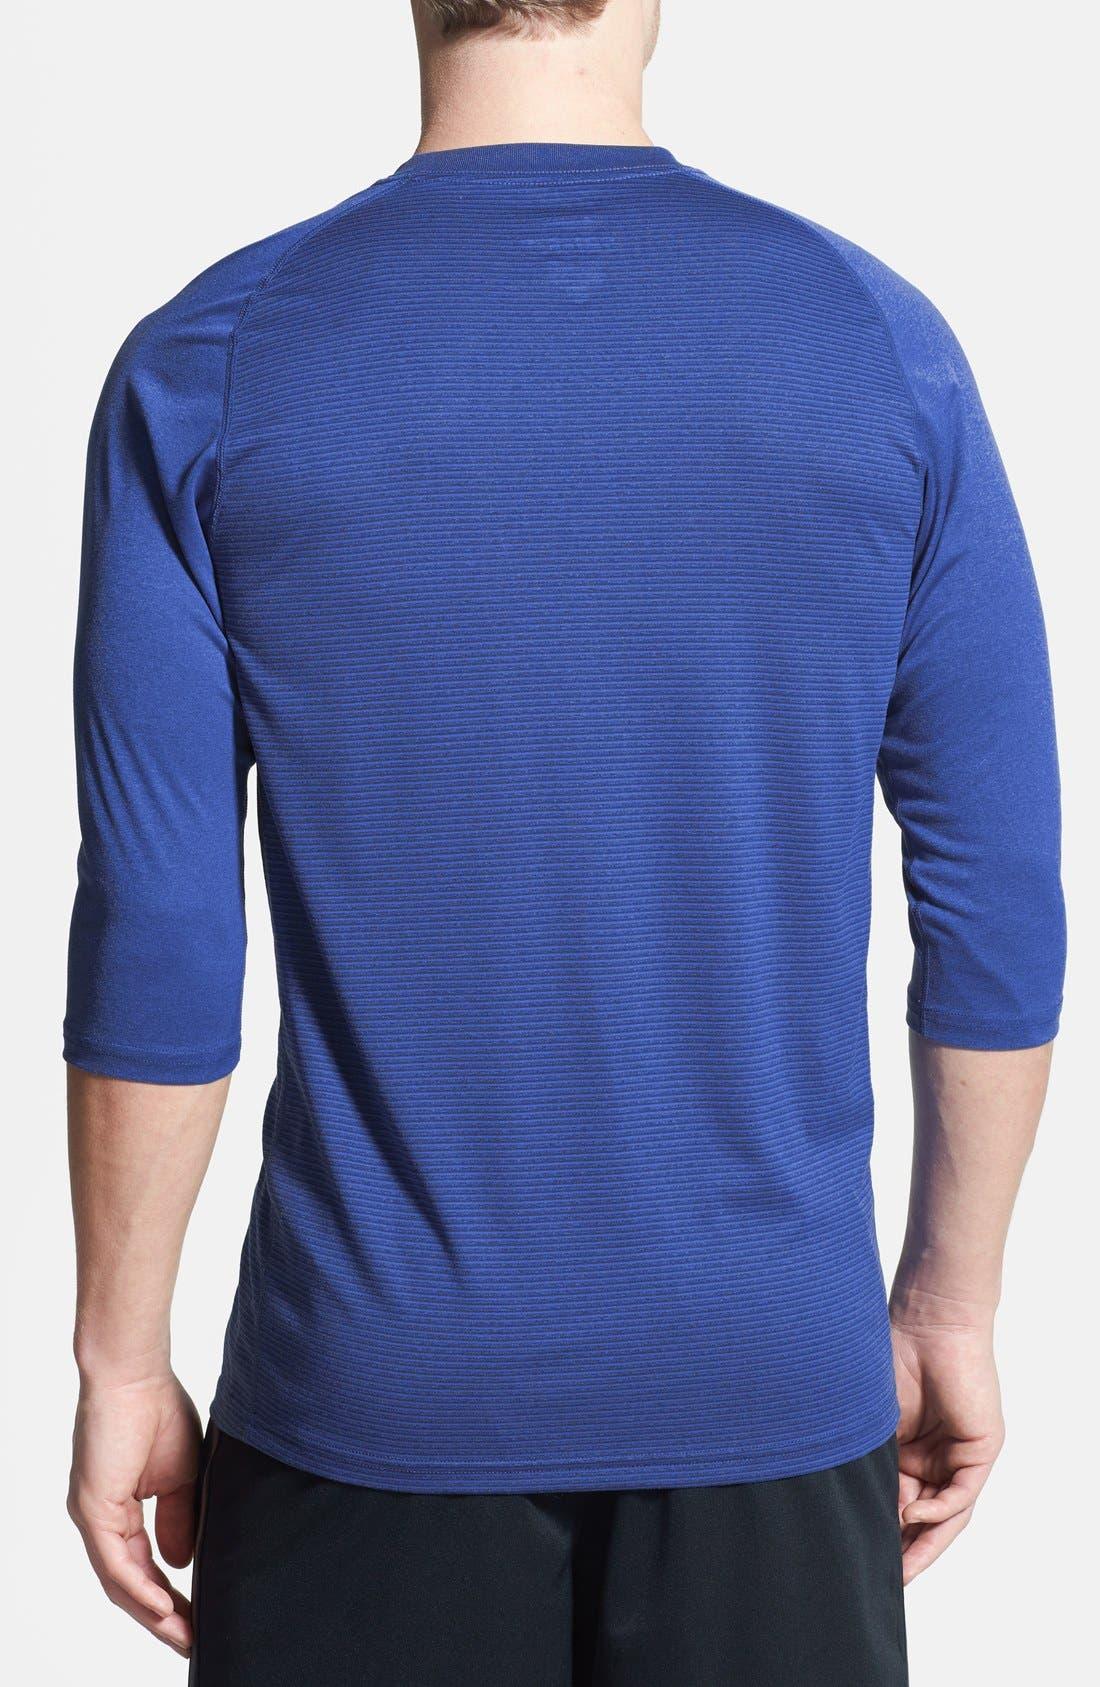 Alternate Image 2  - Nike Dri-FIT Three Quarter Length Raglan Sleeve T-Shirt